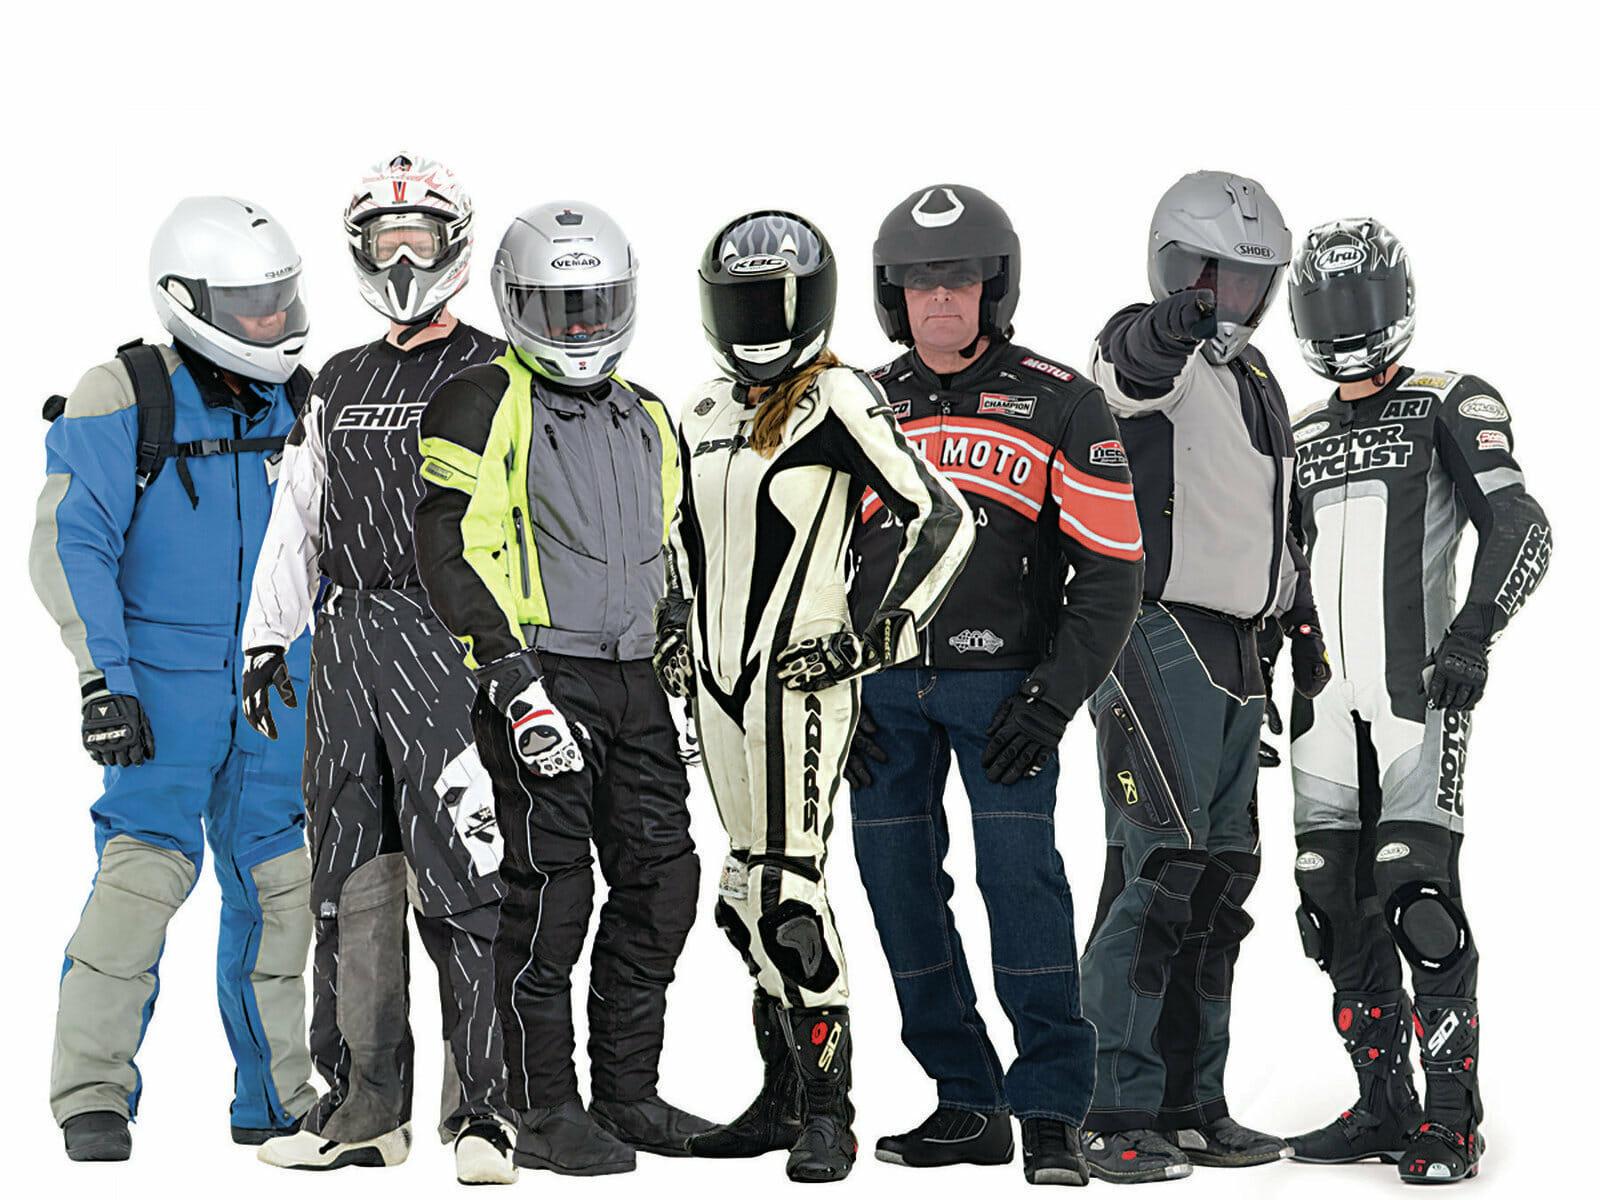 {motorbike jeans ruggedmotorbikejeans.com|motorcycle jeans ruggedmotorbikejeans.com|motorbike trousers ruggedmotorbikejeans.com|kevlar jeans ruggedmotorbikejeans.com|motorcycle trousers ruggedmotorbikejeans.com|motorbike pants ruggedmotorbikejeans.com|motorcycle pants ruggedmotorbikejeans.com|kevlar pants ruggedmotorbikejeans.com|biker jeans ruggedmotorbikejeans.com|biker pants ruggedmotorbikejeans.com|biker trousers ruggedmotorbikejeans.com|rugged jeans ruggedmotorbikejeans.com|rugged motorbike jeans ruggedmotorbikejeans.com|biker jeans mens ruggedmotorbikejeans.com|cheap biker jeans ruggedmotorbikejeans.com|kevlar motorcycle jeans ruggedmotorbikejeans.com|riders jeans ruggedmotorbikejeans.com|best motorcycle jeans ruggedmotorbikejeans.com|motorcycle riding jeans ruggedmotorbikejeans.com|biker jeans womens ruggedmotorbikejeans.com|kevlar motorcycle pants ruggedmotorbikejeans.com|moto denim jeans ruggedmotorbikejeans.com|best motorcycle pants ruggedmotorbikejeans.com|motorcycle jeans mens ruggedmotorbikejeans.com|jean kevlar ruggedmotorbikejeans.com|motorcycle cargo pants ruggedmotorbikejeans.com|biker denim jeans ruggedmotorbikejeans.com|kevlar riding jeans ruggedmotorbikejeans.com|womens kevlar jeans ruggedmotorbikejeans.com|best kevlar jeans ruggedmotorbikejeans.com|ladies kevlar jeans ruggedmotorbikejeans.com|kevlar trousers ruggedmotorbikejeans.com|biker jeans mens cheap ruggedmotorbikejeans.com|moto denim jeans mens ruggedmotorbikejeans.com|motorbike kevlar jeans ruggedmotorbikejeans.com|motorcycle denim jeans ruggedmotorbikejeans.com|womens motorcycle jeans ruggedmotorbikejeans.com|skinny motorcycle jeans ruggedmotorbikejeans.com|leather motorcycle jeans ruggedmotorbikejeans.com|kevlar lined jeans ruggedmotorbikejeans.com|slim fit motorcycle jeans ruggedmotorbikejeans.com|draggin kevlar jeans ruggedmotorbikejeans.com|fully lined kevlar jeans ruggedmotorbikejeans.com|motorcycle denim ruggedmotorbikejeans.com|motorcycle jeans with armor ruggedmotorbikejeans.com